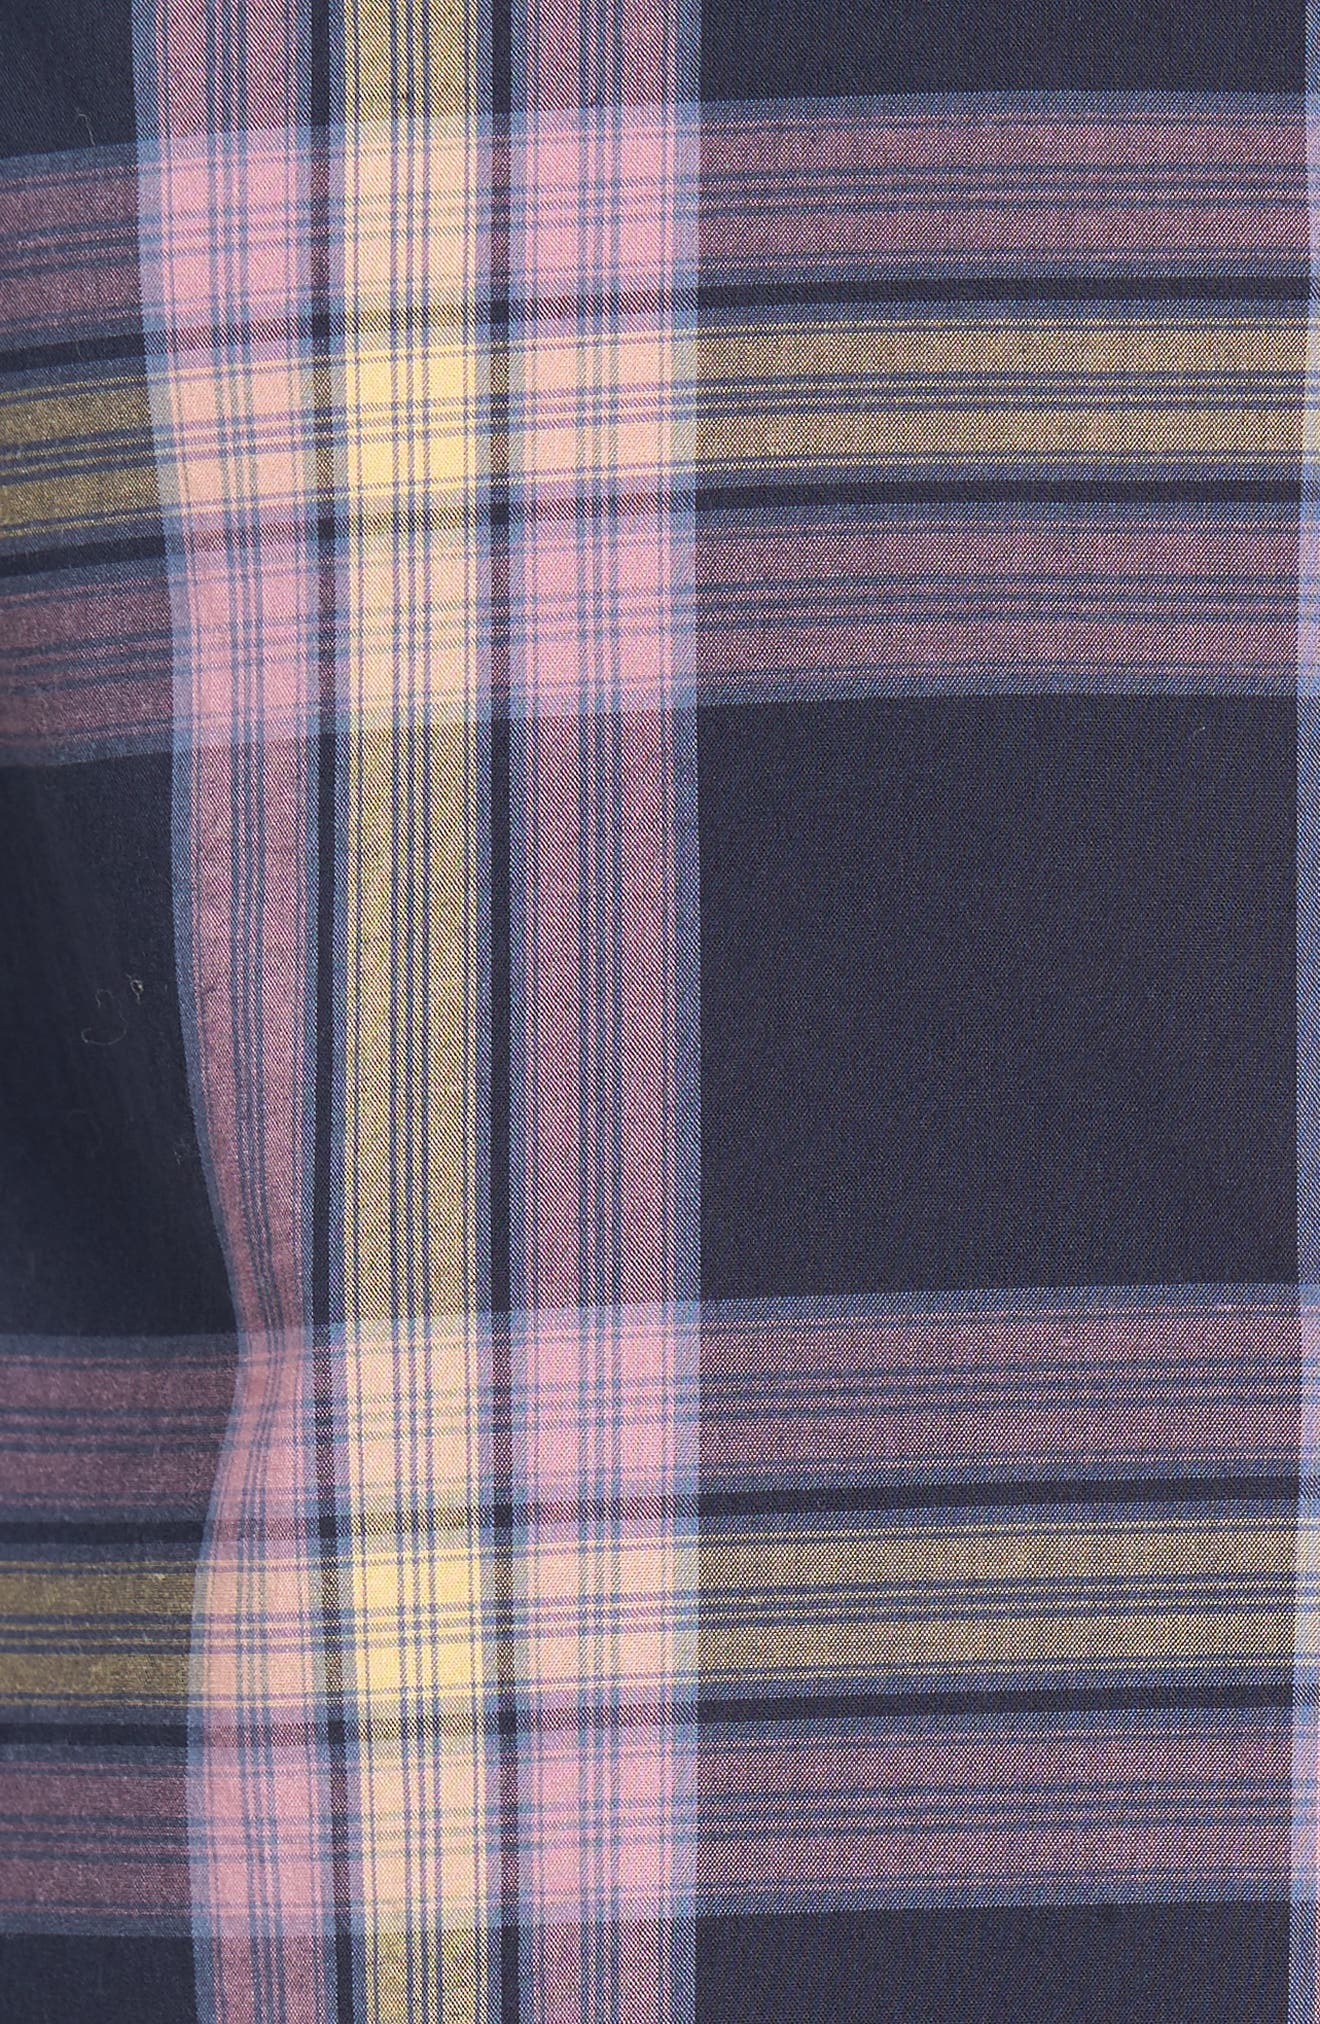 Heritage Slim Fit Plaid Woven Shirt,                             Alternate thumbnail 5, color,                             Dark Sapphire